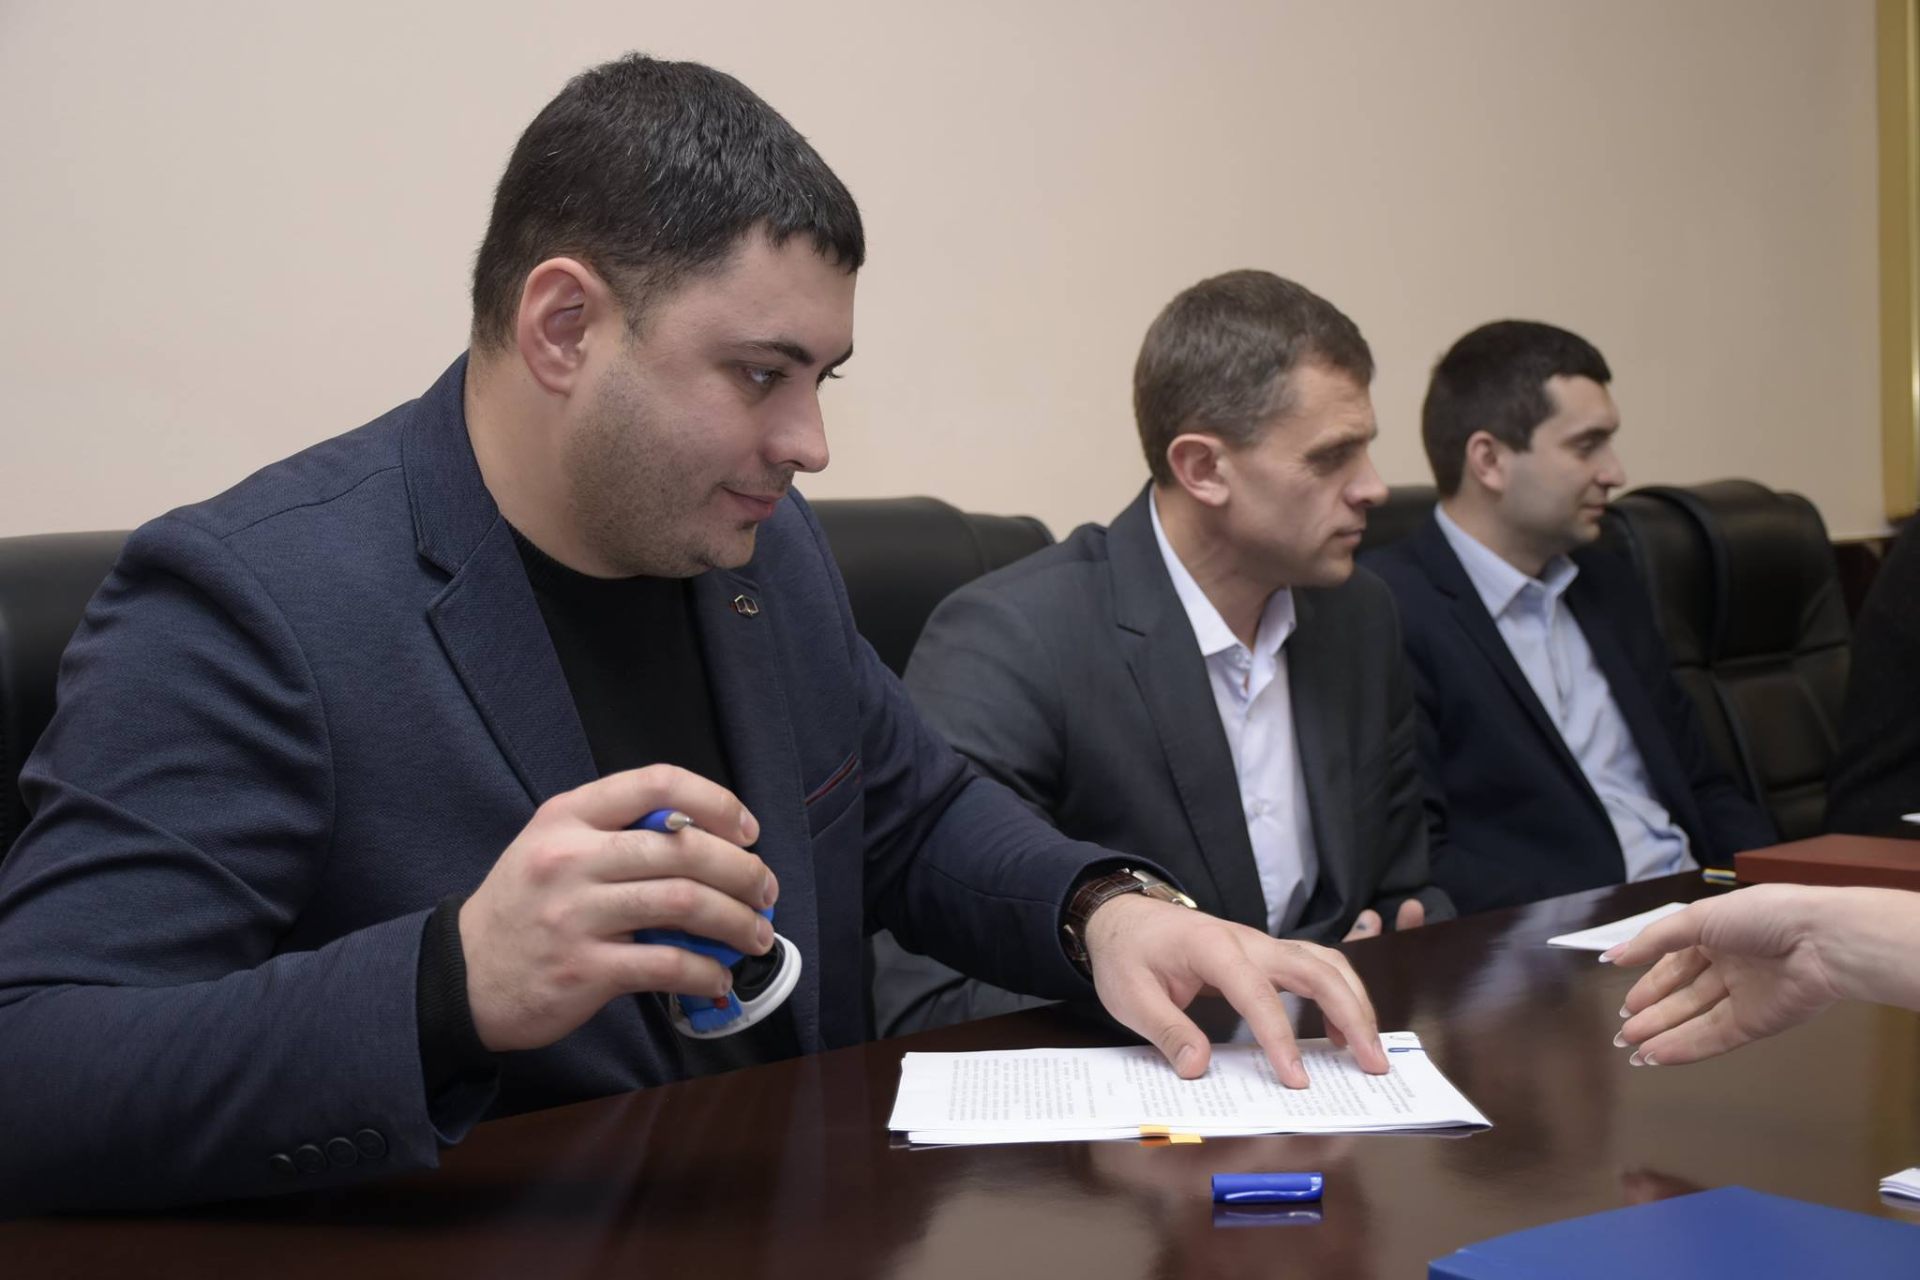 Очільник ГУ Держгеокадастру в Полтавській області Вадим Чувпило передає документи на землю ОТГ